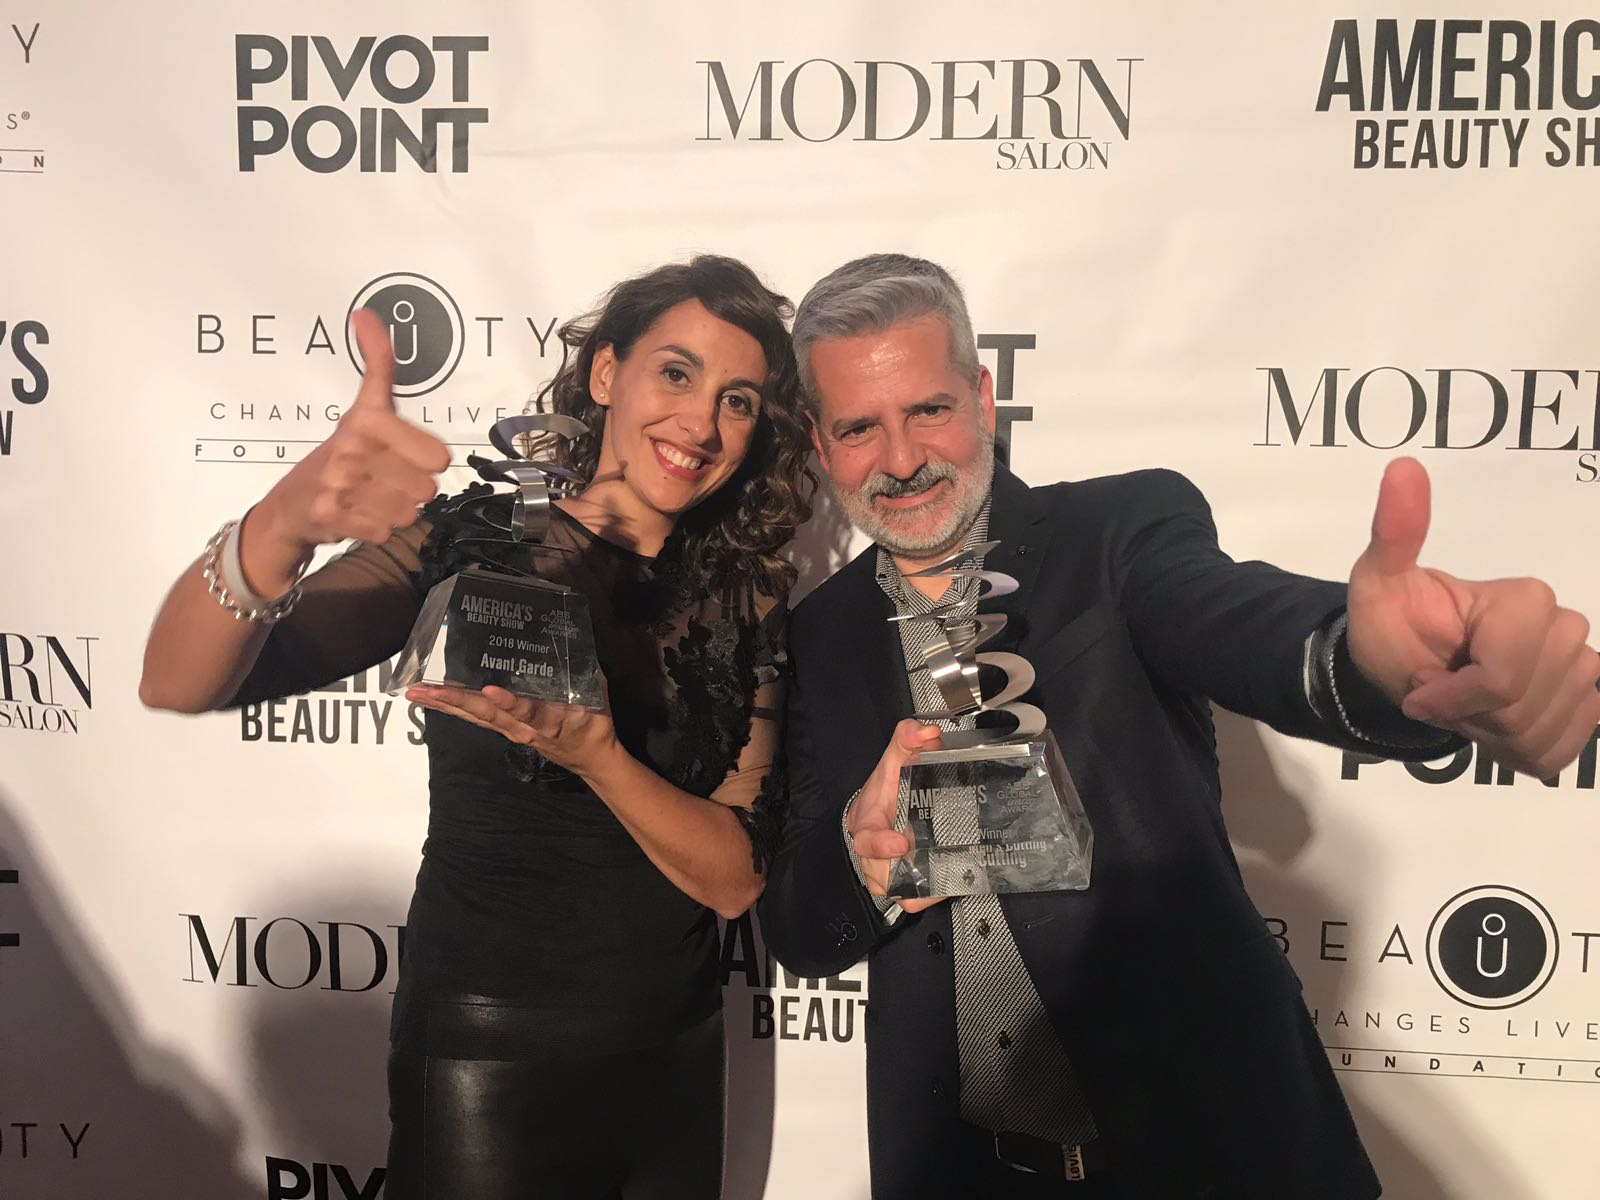 Ziortza Zarauza and Jordi Perez ABS Global Images Winners